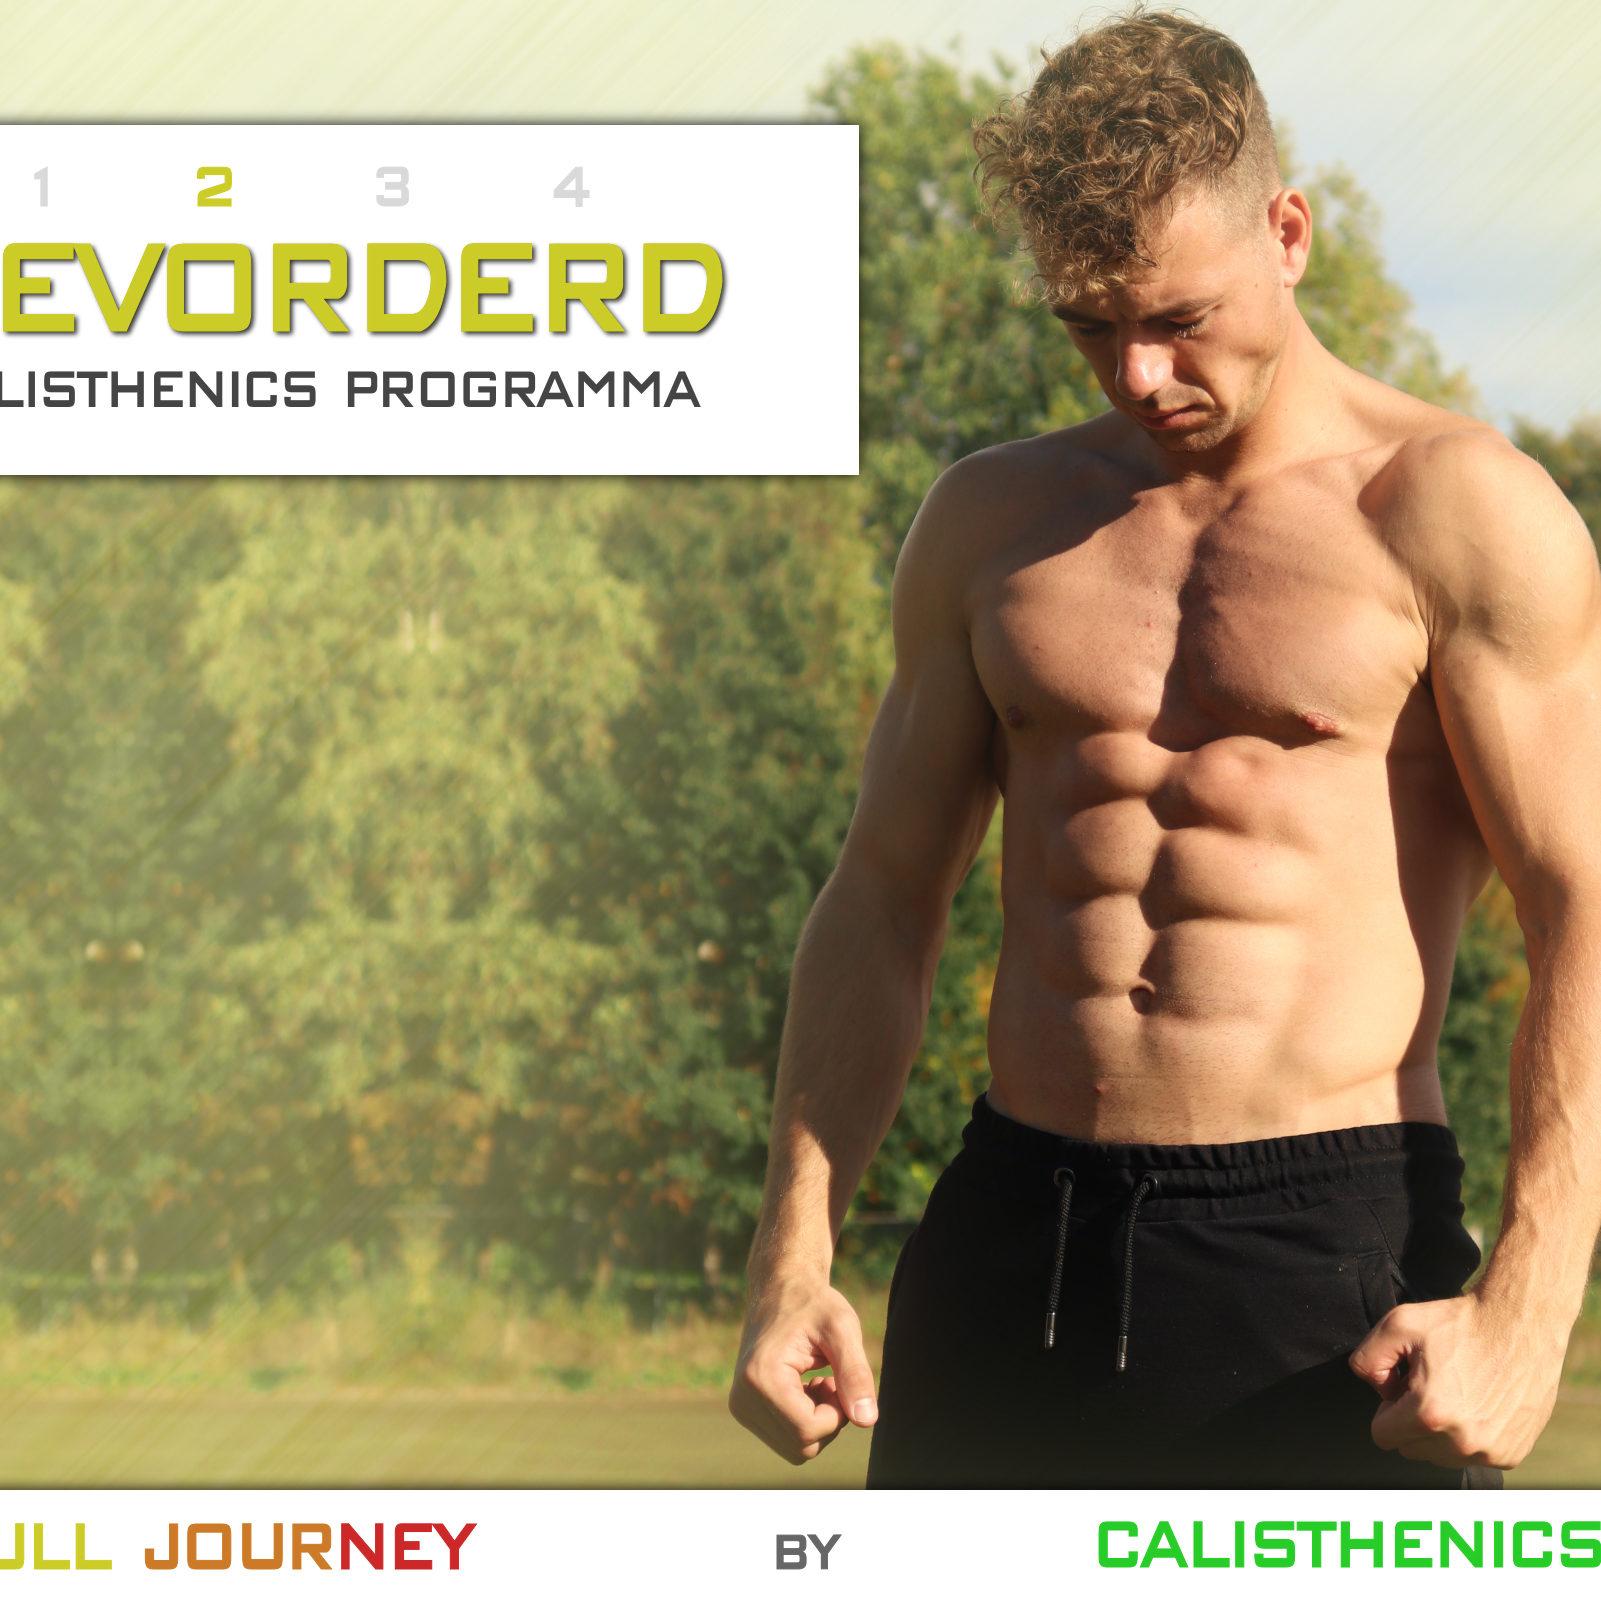 Gevorderd Calisthenics Workout Programma